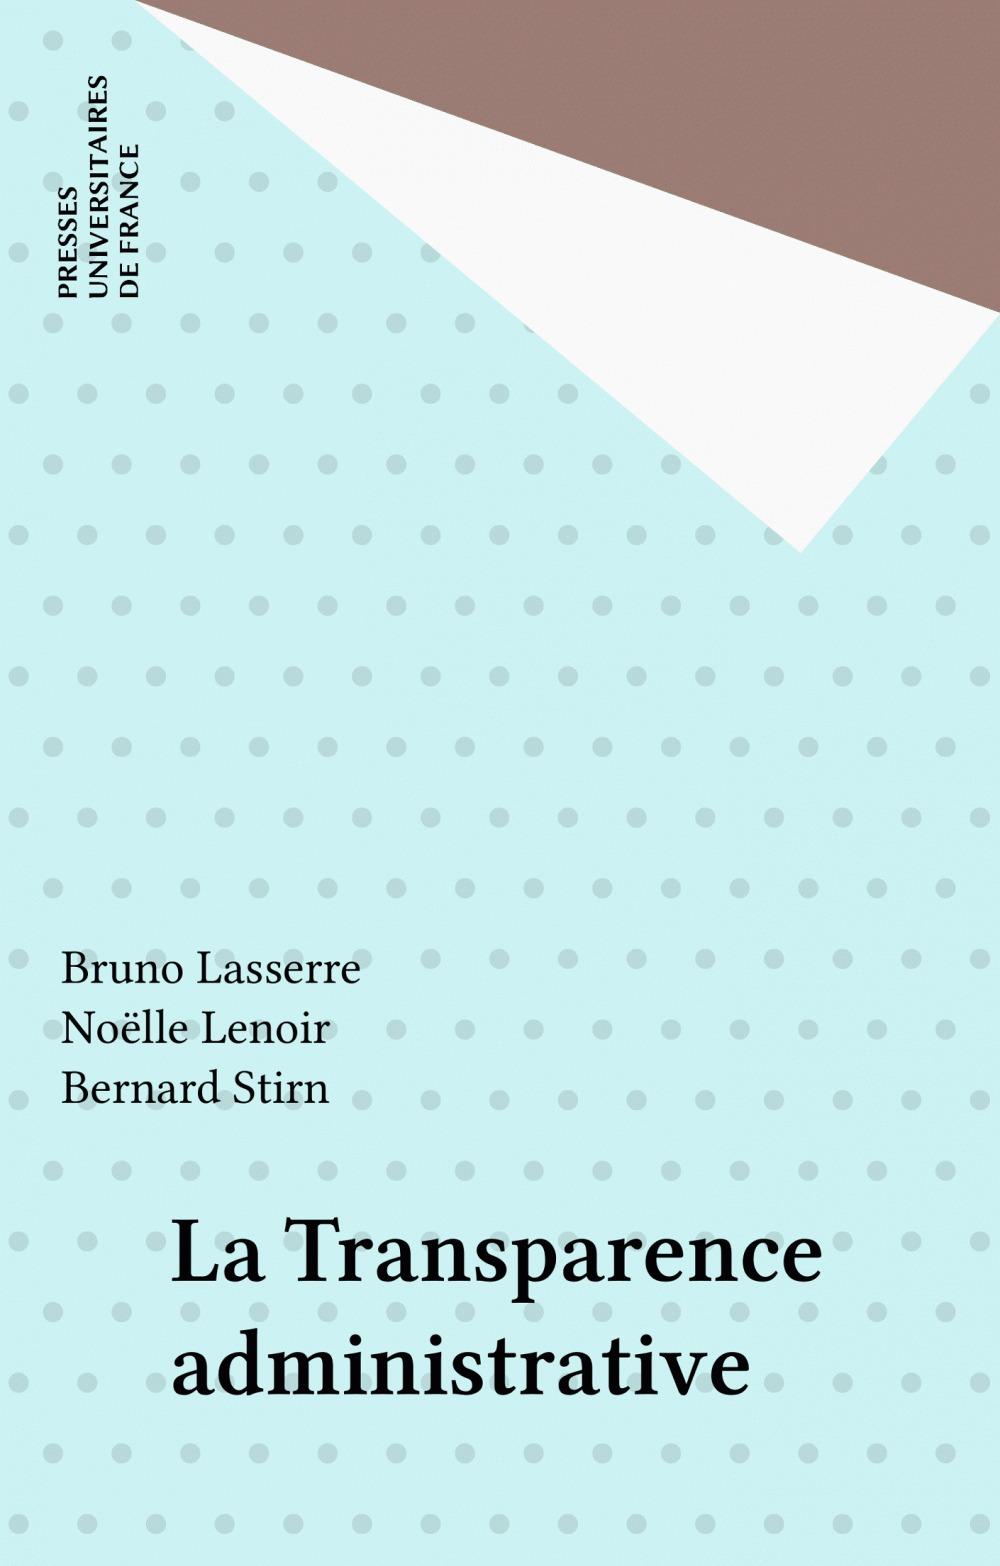 La transparence administrative  - Bruno Lasserre  - Bernard Stirn  - Noëlle Lenoir